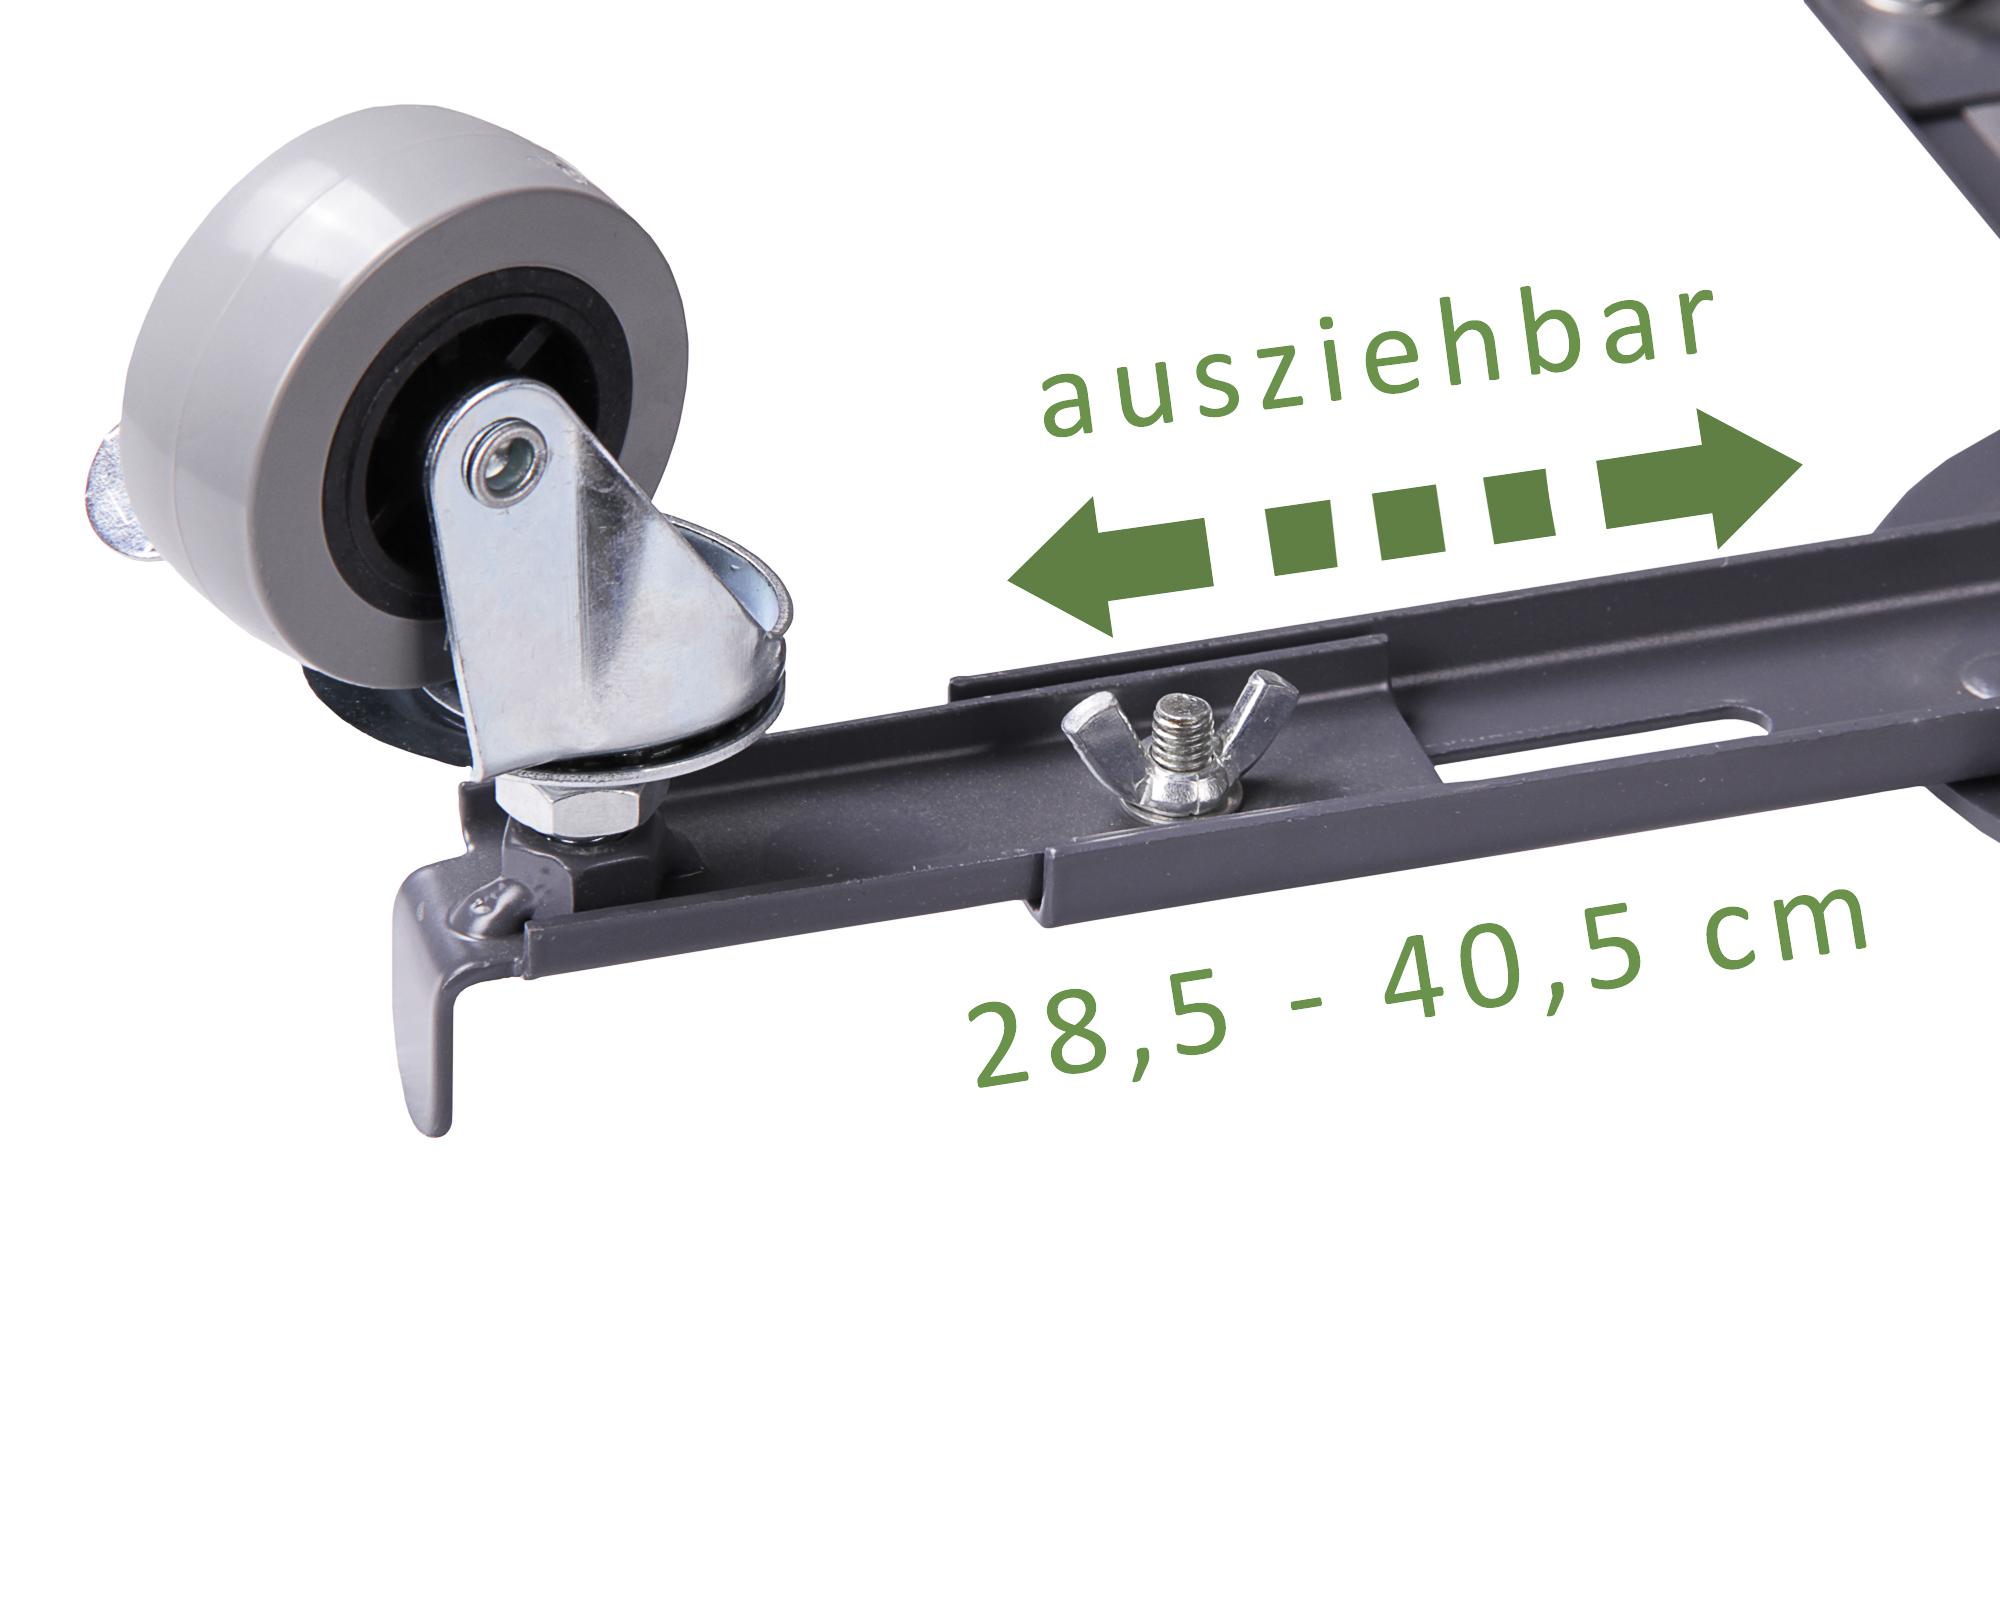 ondis24 pflanzenroller blumenroller metall universal. Black Bedroom Furniture Sets. Home Design Ideas